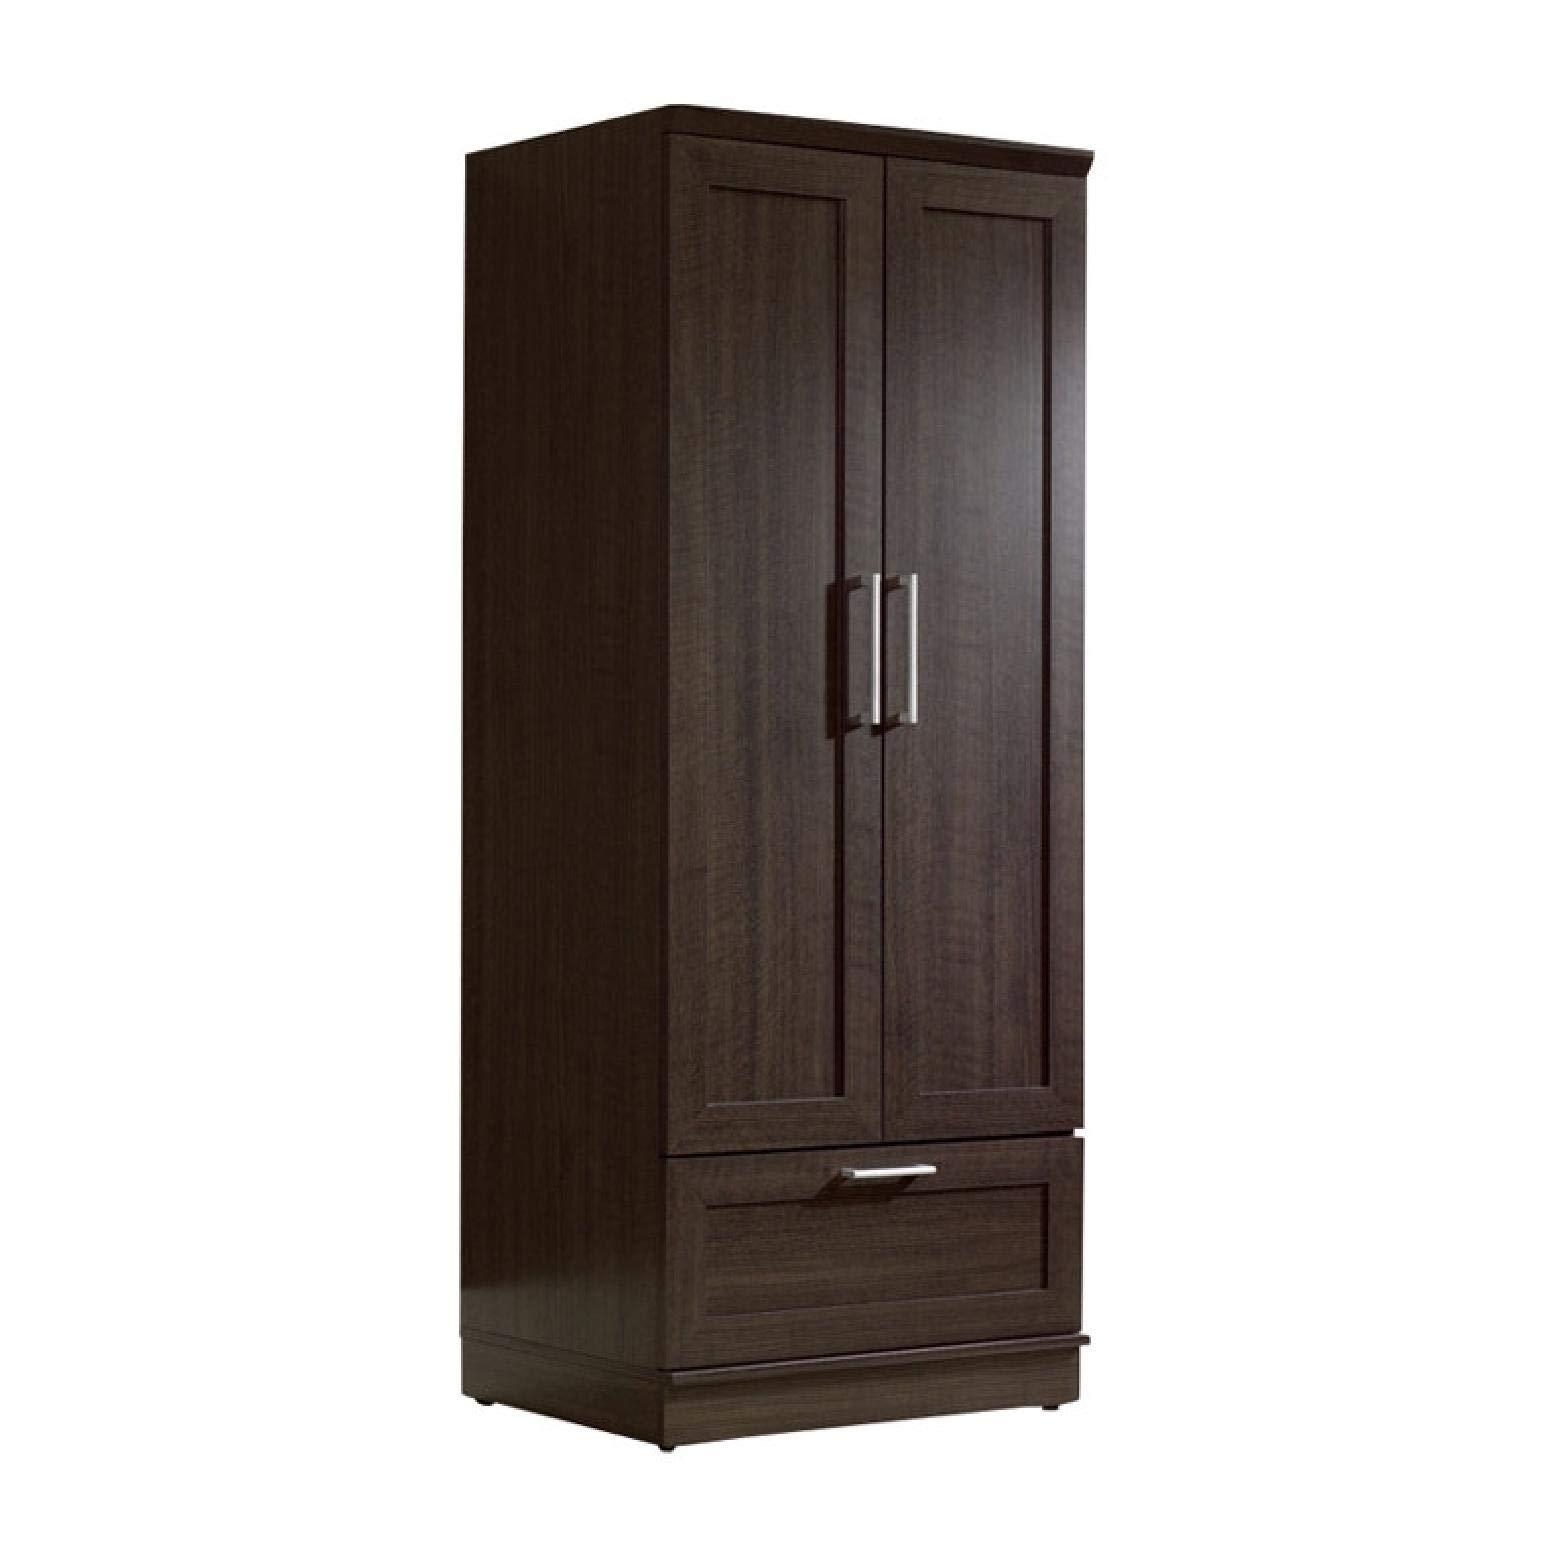 Dark Brown Wood Wardrobe Cabinet Armoire with Garment Rod, Dark Brown Wood Wardrobe Cabinet Armoire with Garment Rod by HEATAPPLY